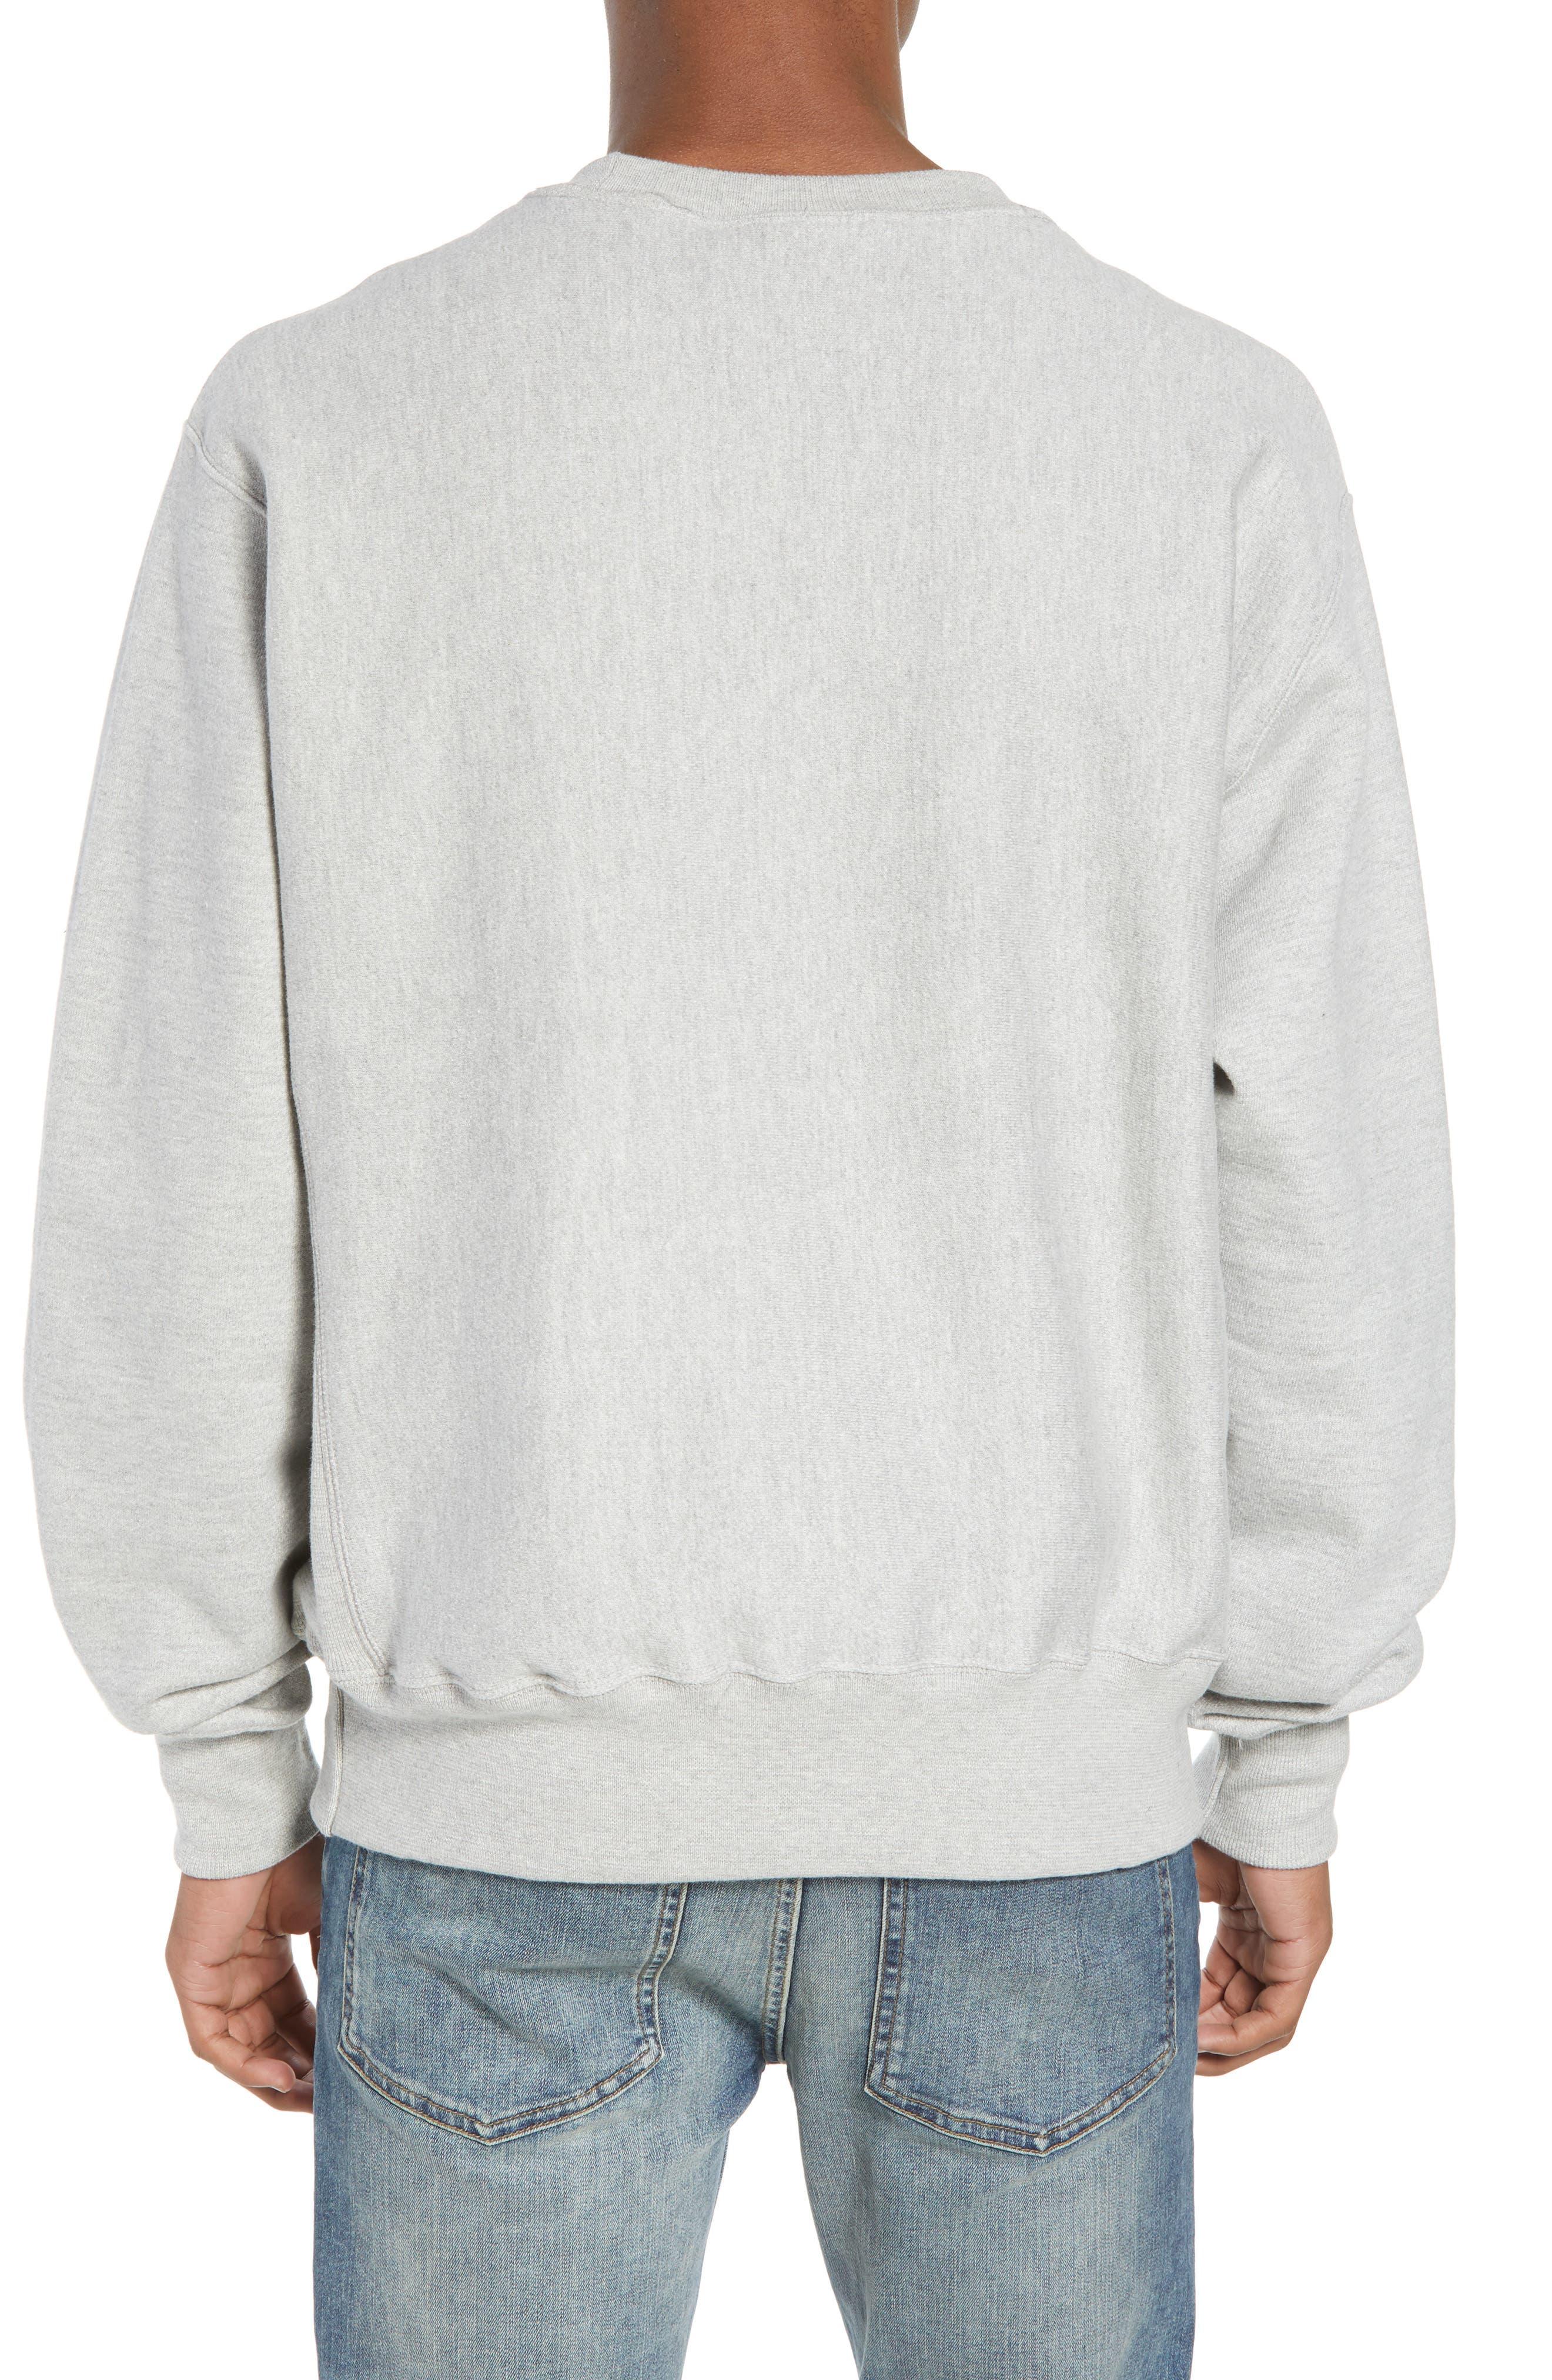 CHAMPION, Reverse Weave Sweatshirt, Alternate thumbnail 2, color, OXFORD GRAY